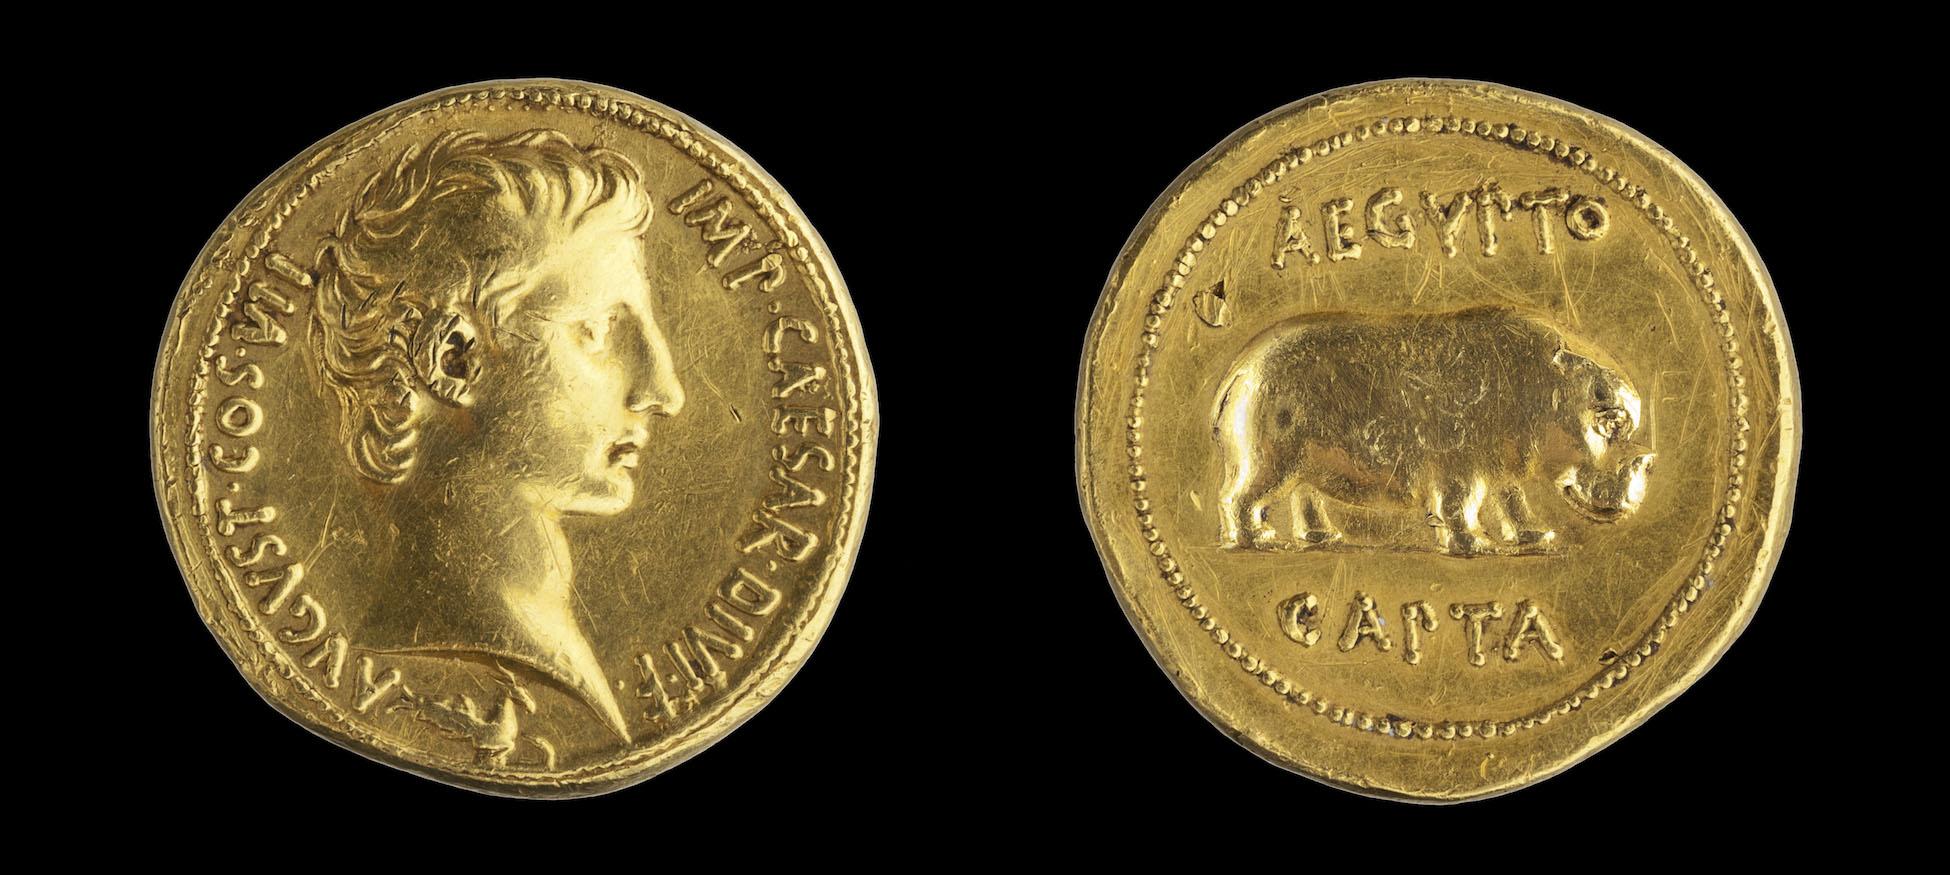 Fig. 5. Quaternion of Augustus, 27 B.C.E., gold, Pergamon(?). Madrid, Museo Arqueológico Nacional, inv. no. 1921/9/1 (Fernando Velasco; courtesy Museo Arqueológico Nacional, Madrid).